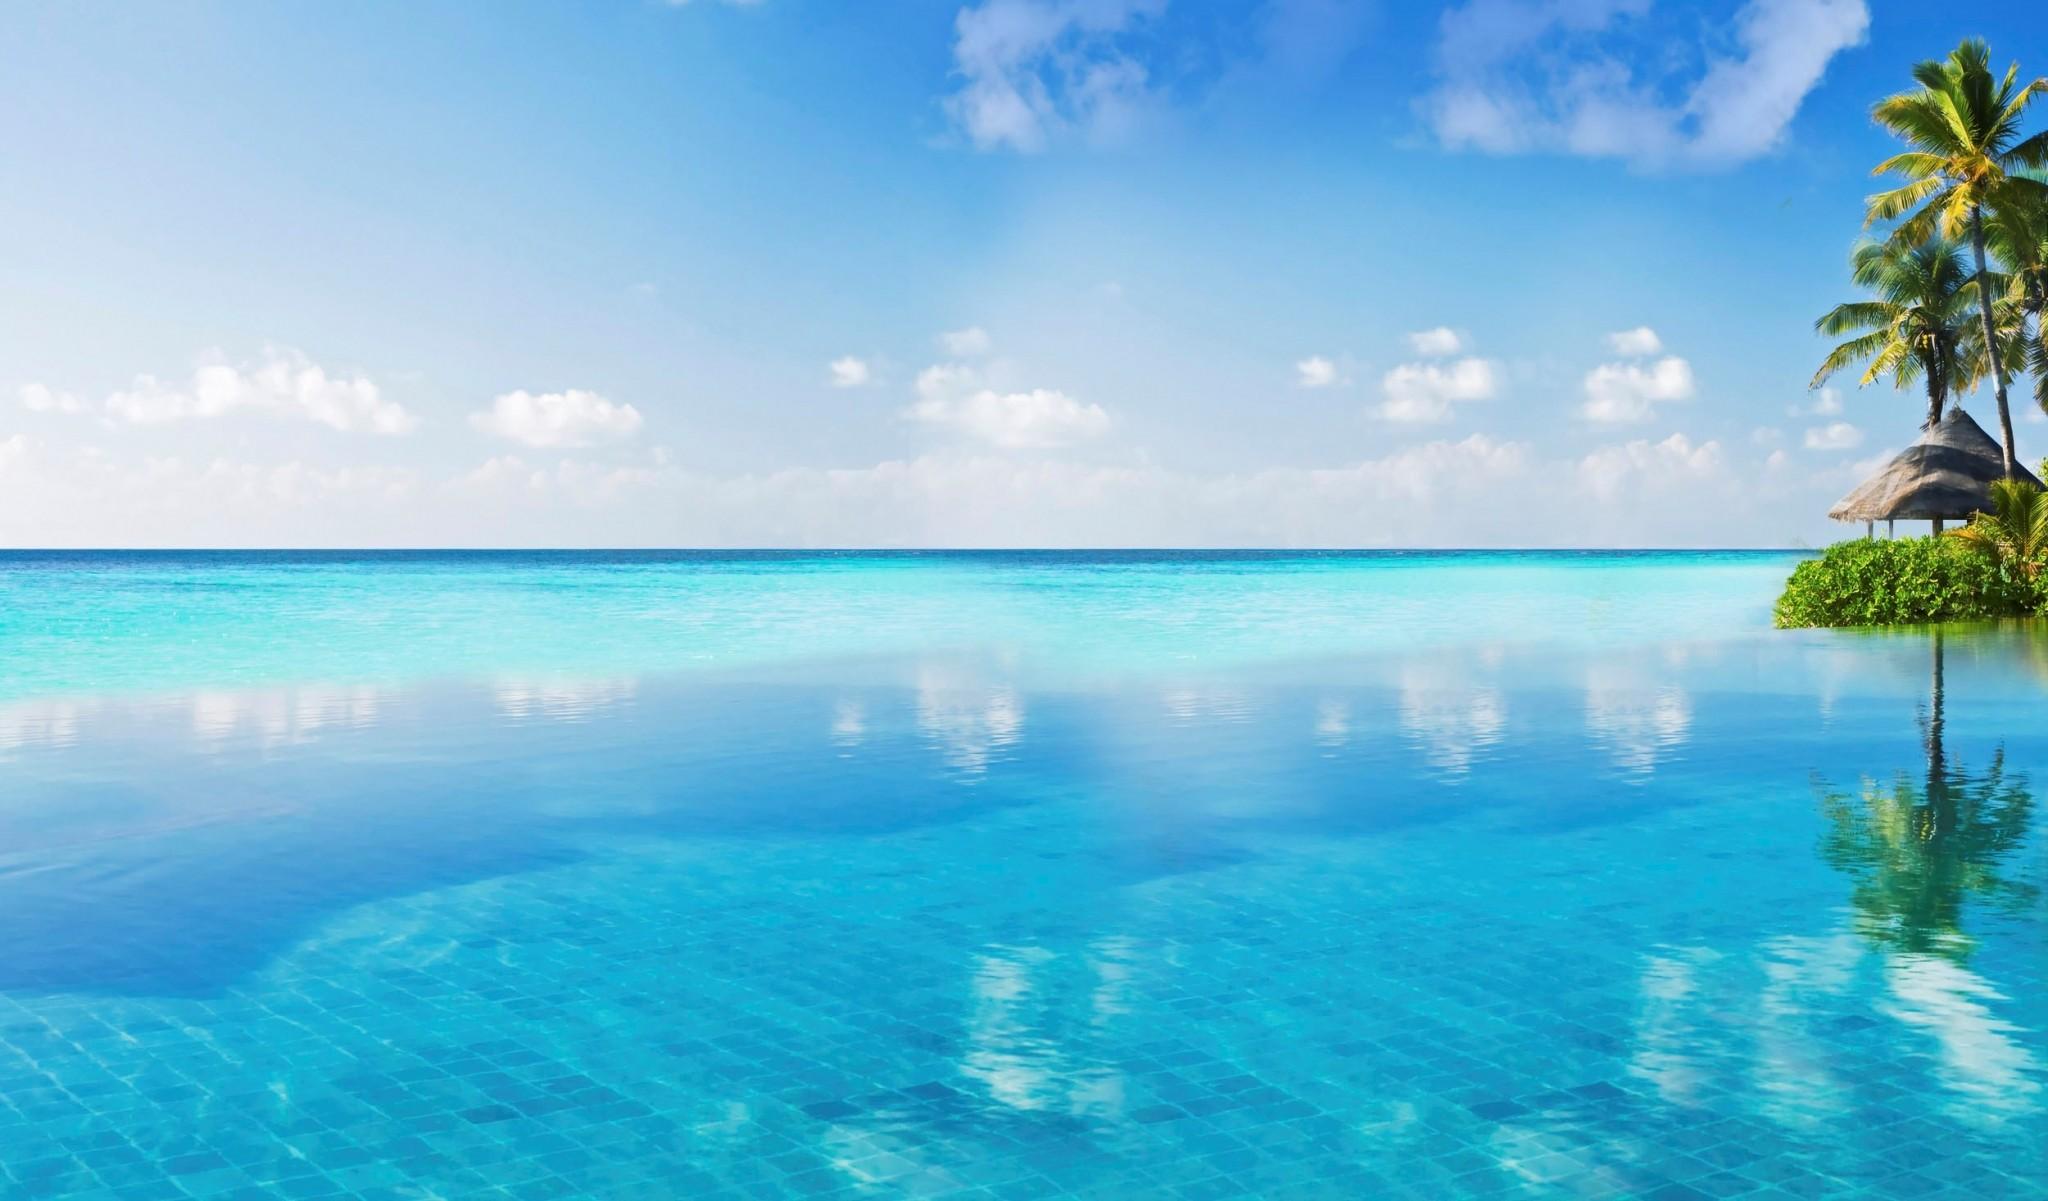 Water desktop background wallpapertag - Aquatic wallpaper ...